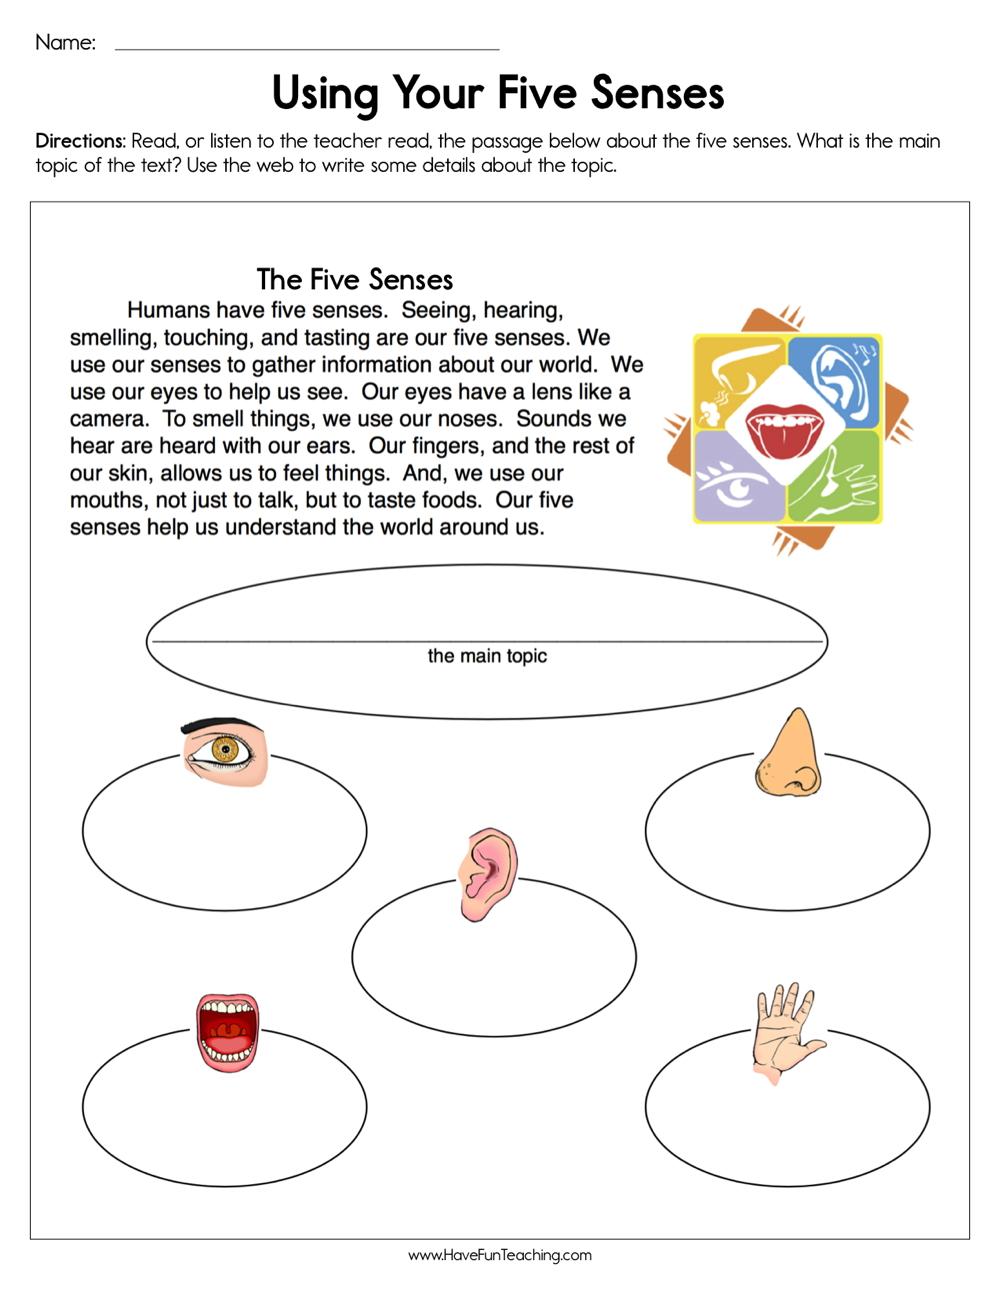 medium resolution of Using Your Five Senses Worksheet • Have Fun Teaching